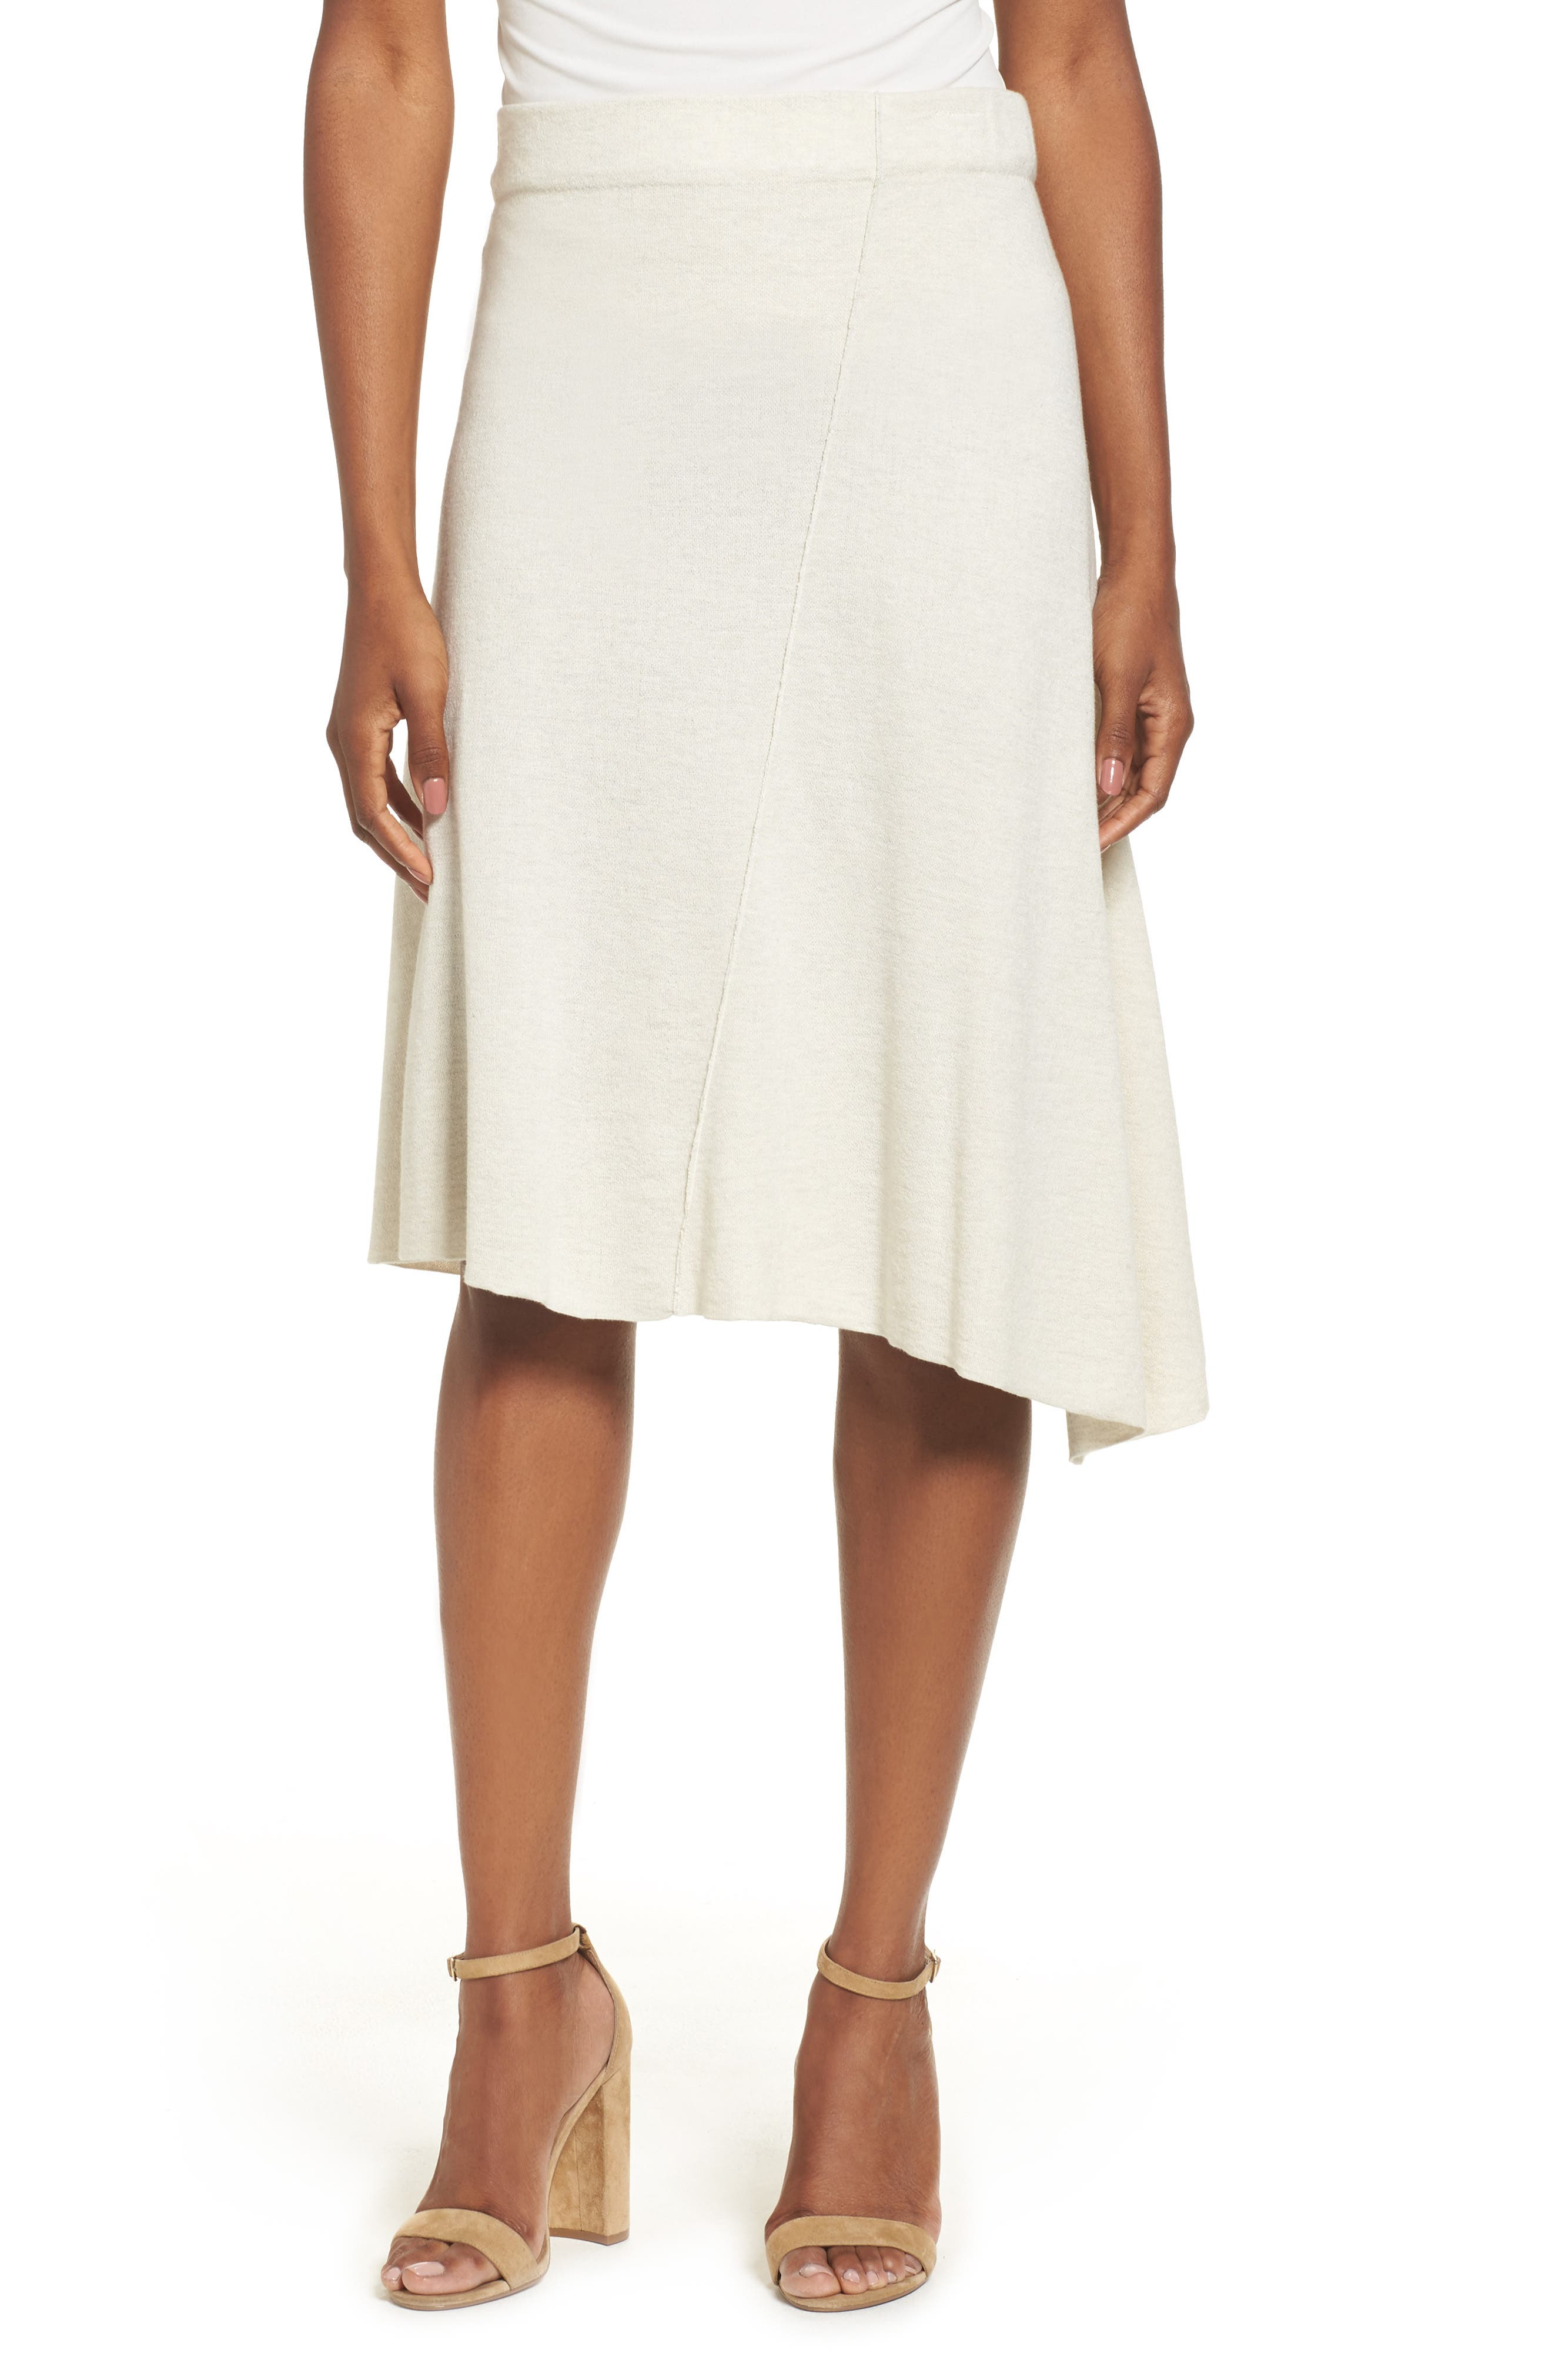 Mod Twirl Skirt,                             Main thumbnail 1, color,                             252